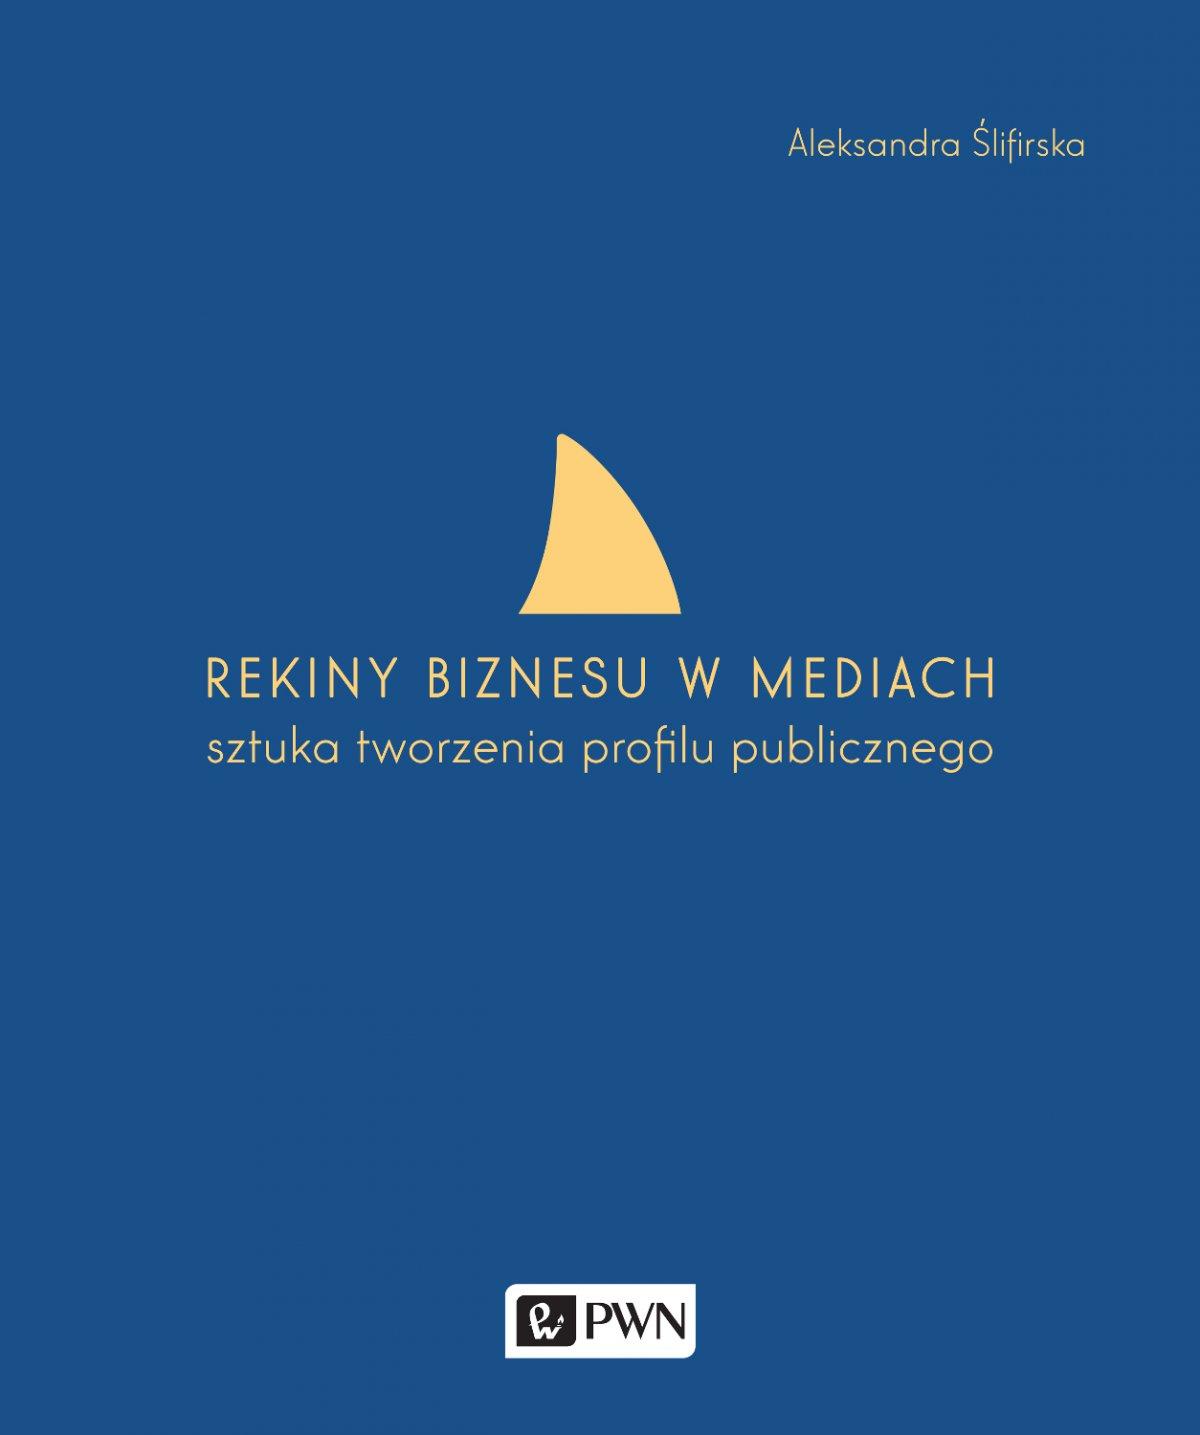 Rekiny biznesu w mediach - ebook